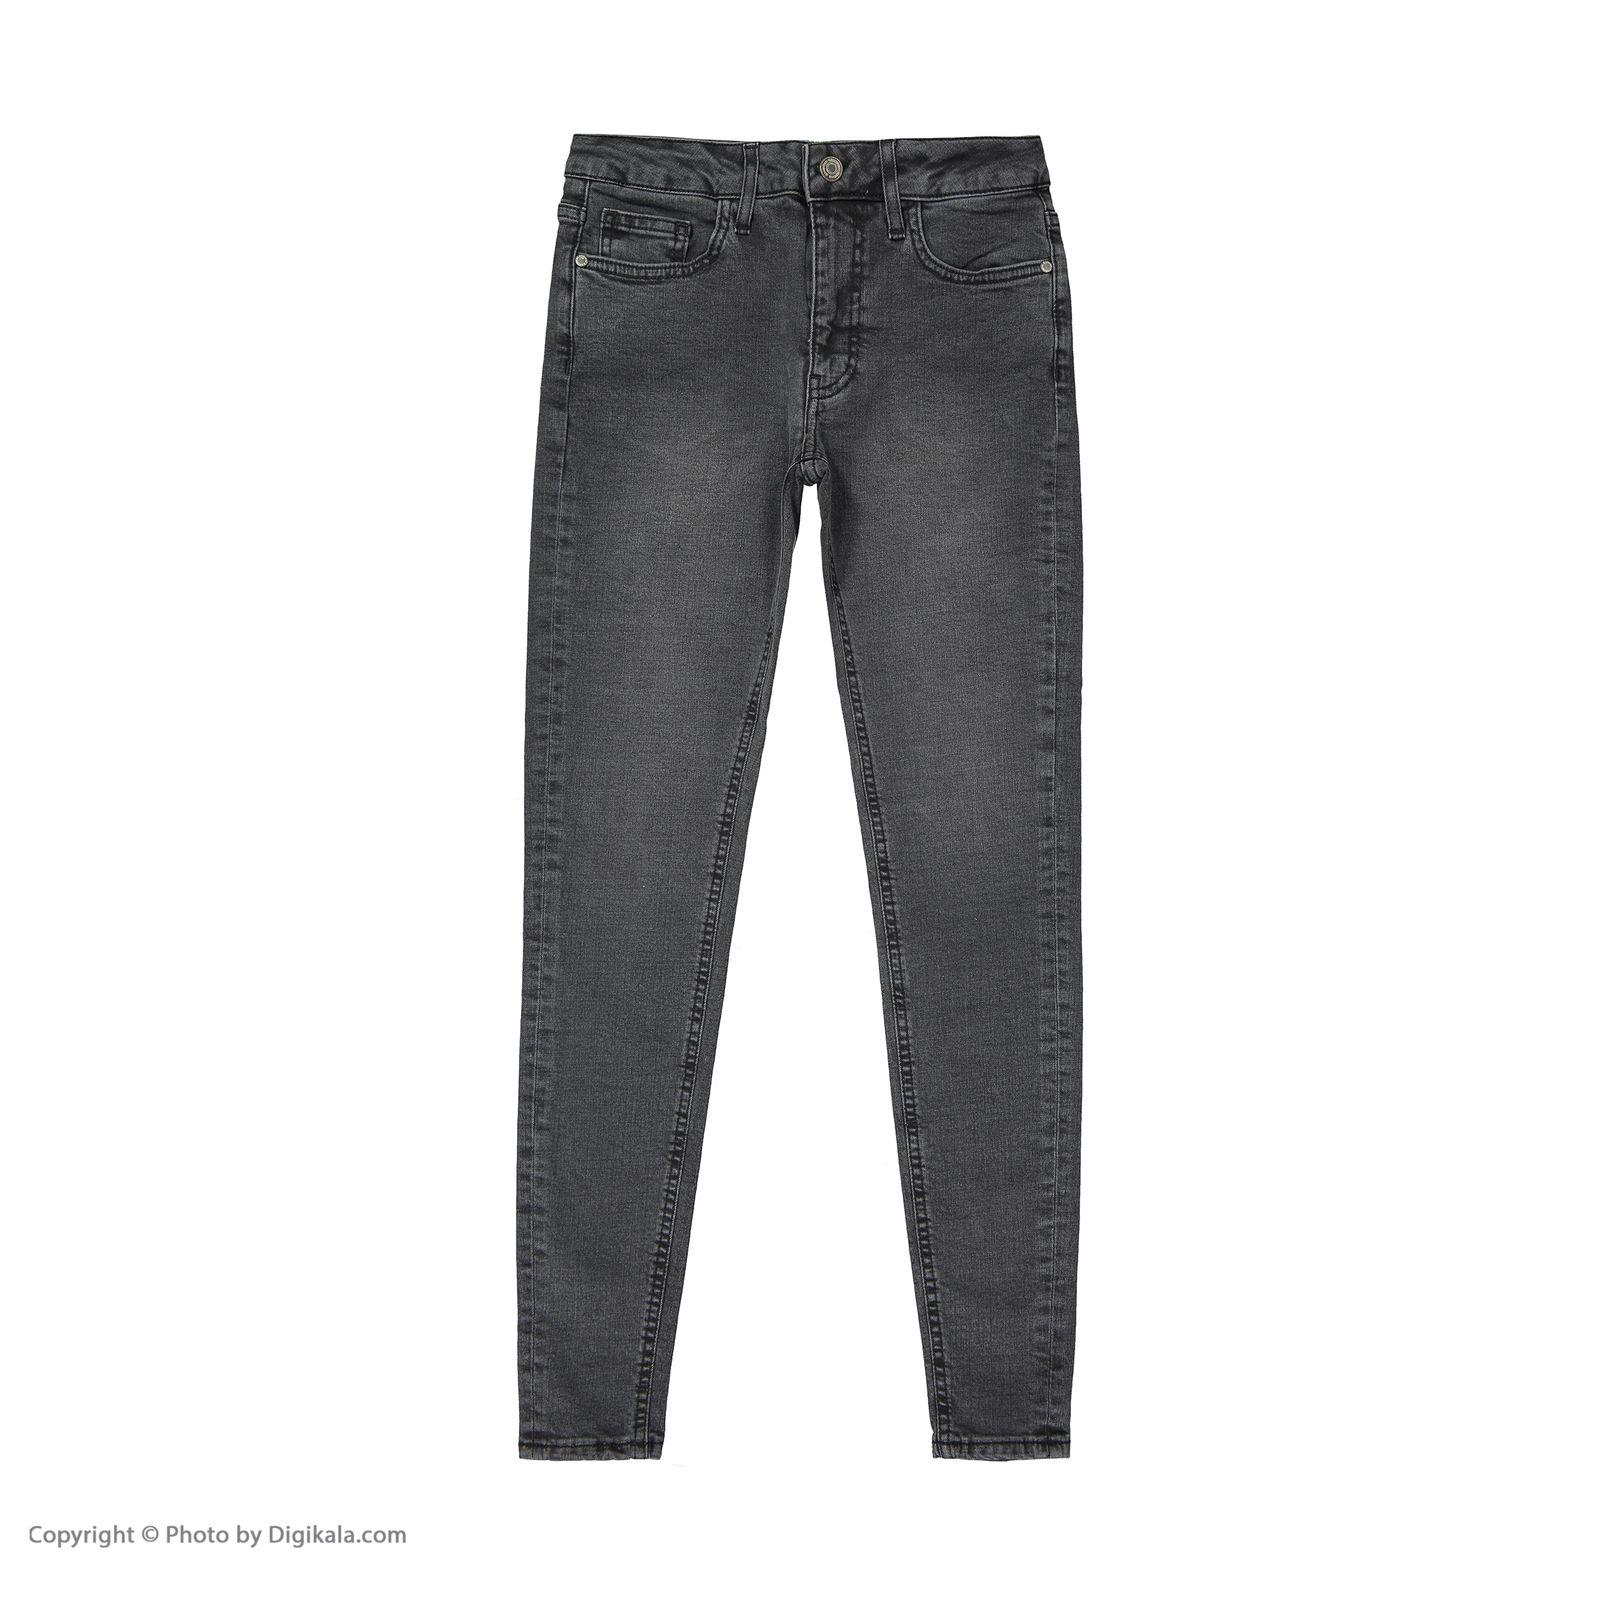 شلوار جین زنانه آر ان اس مدل 1104074-93 -  - 2